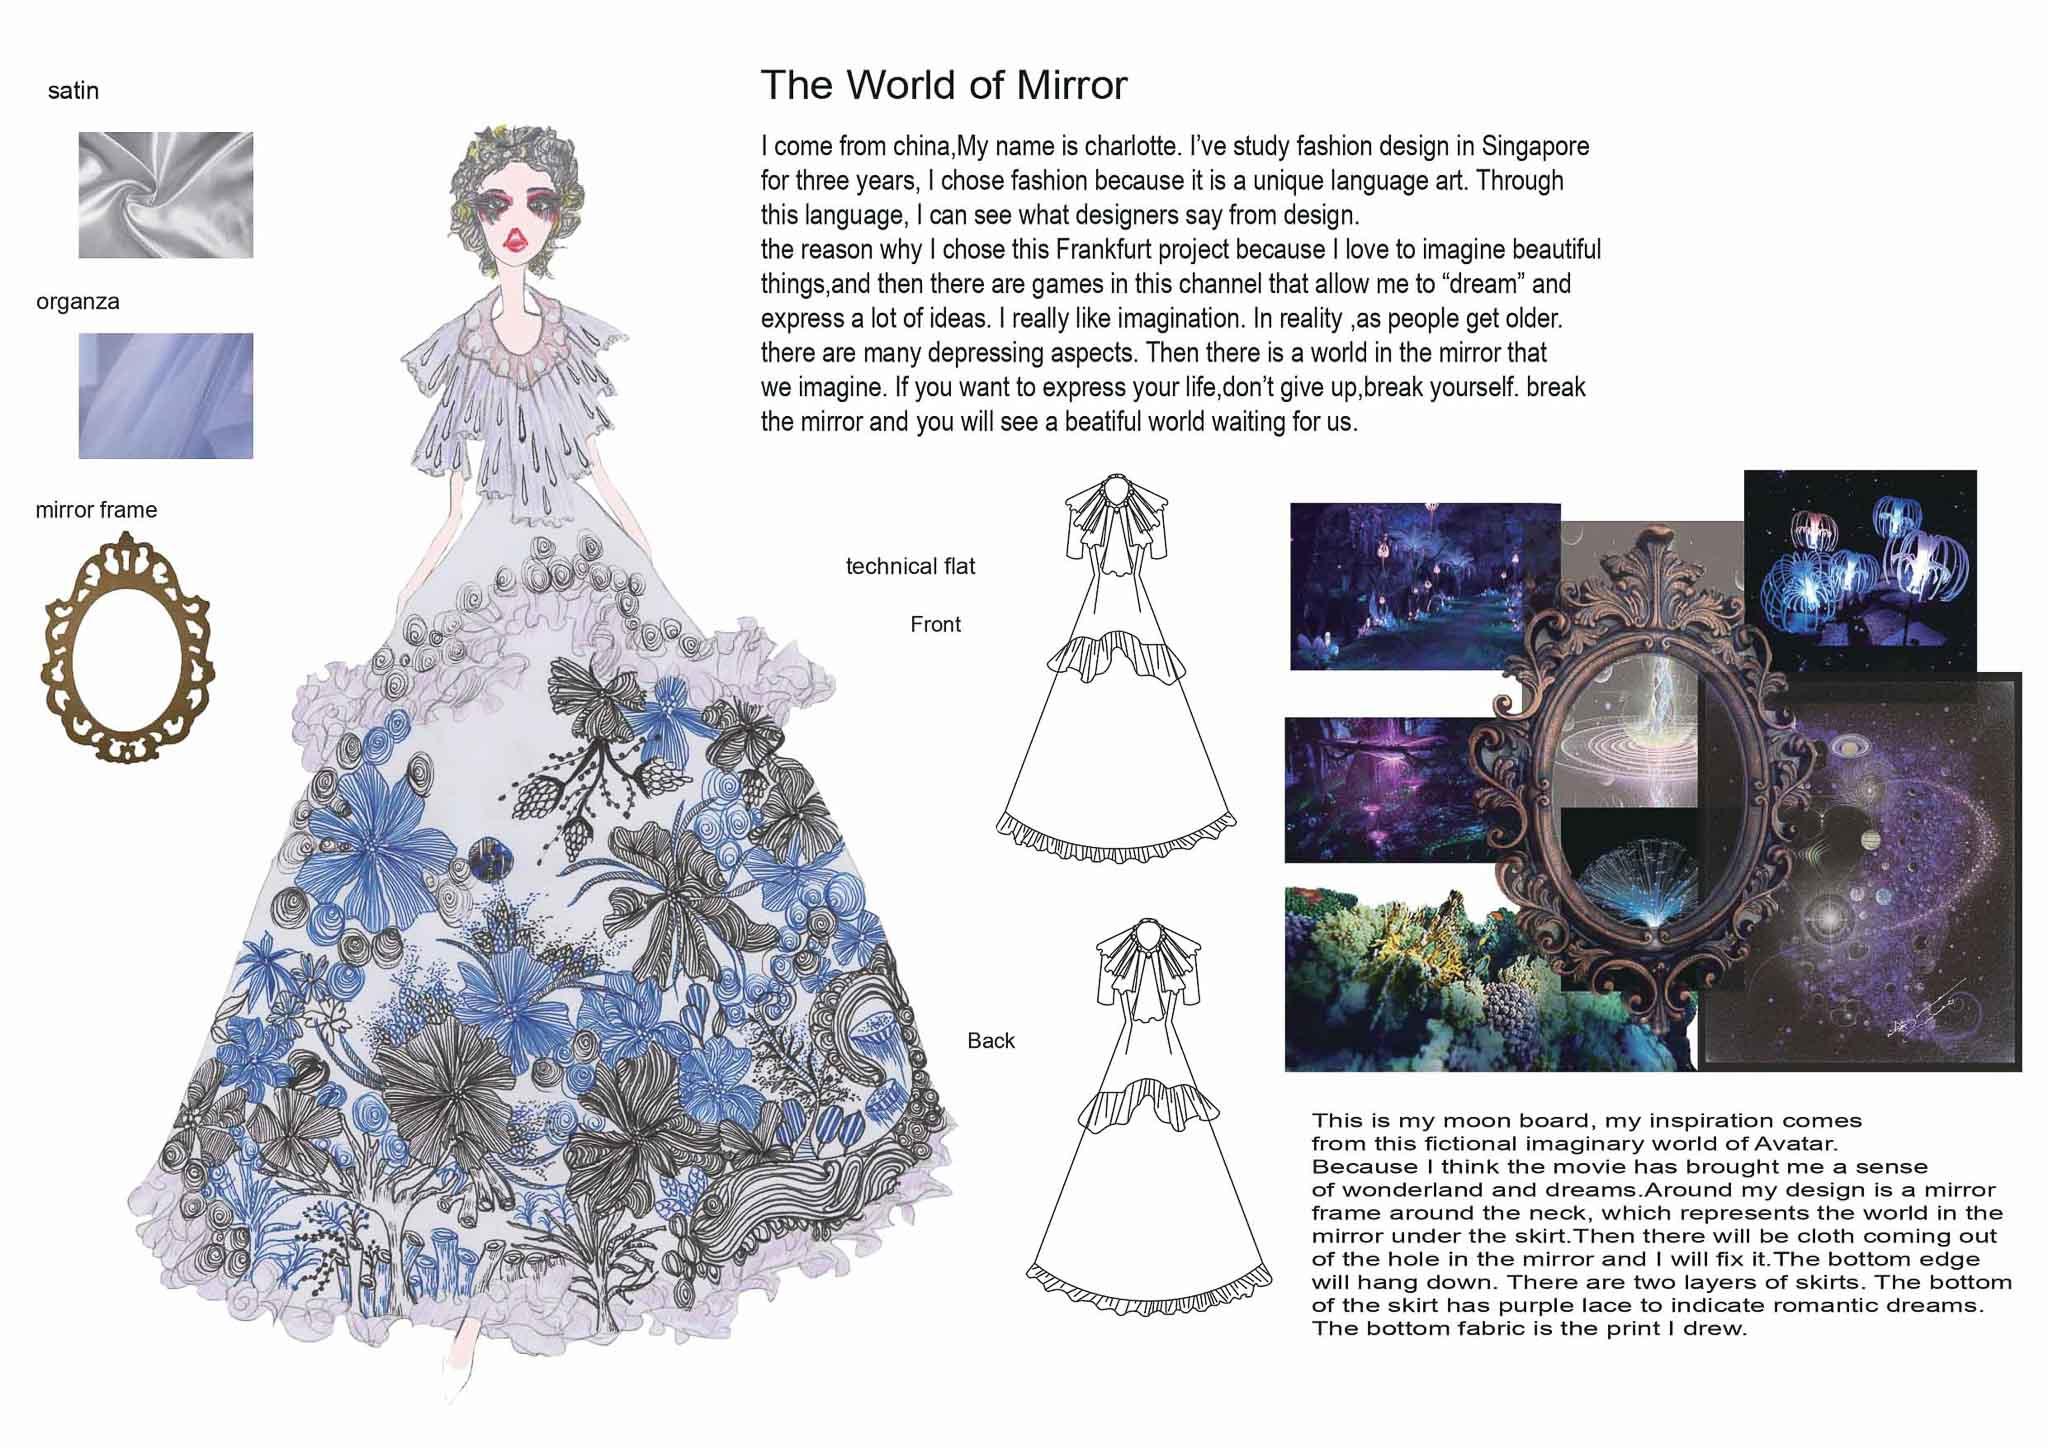 The World of Mirror: Lu Junxin, China, Student, Raffles Design Institute Singapore